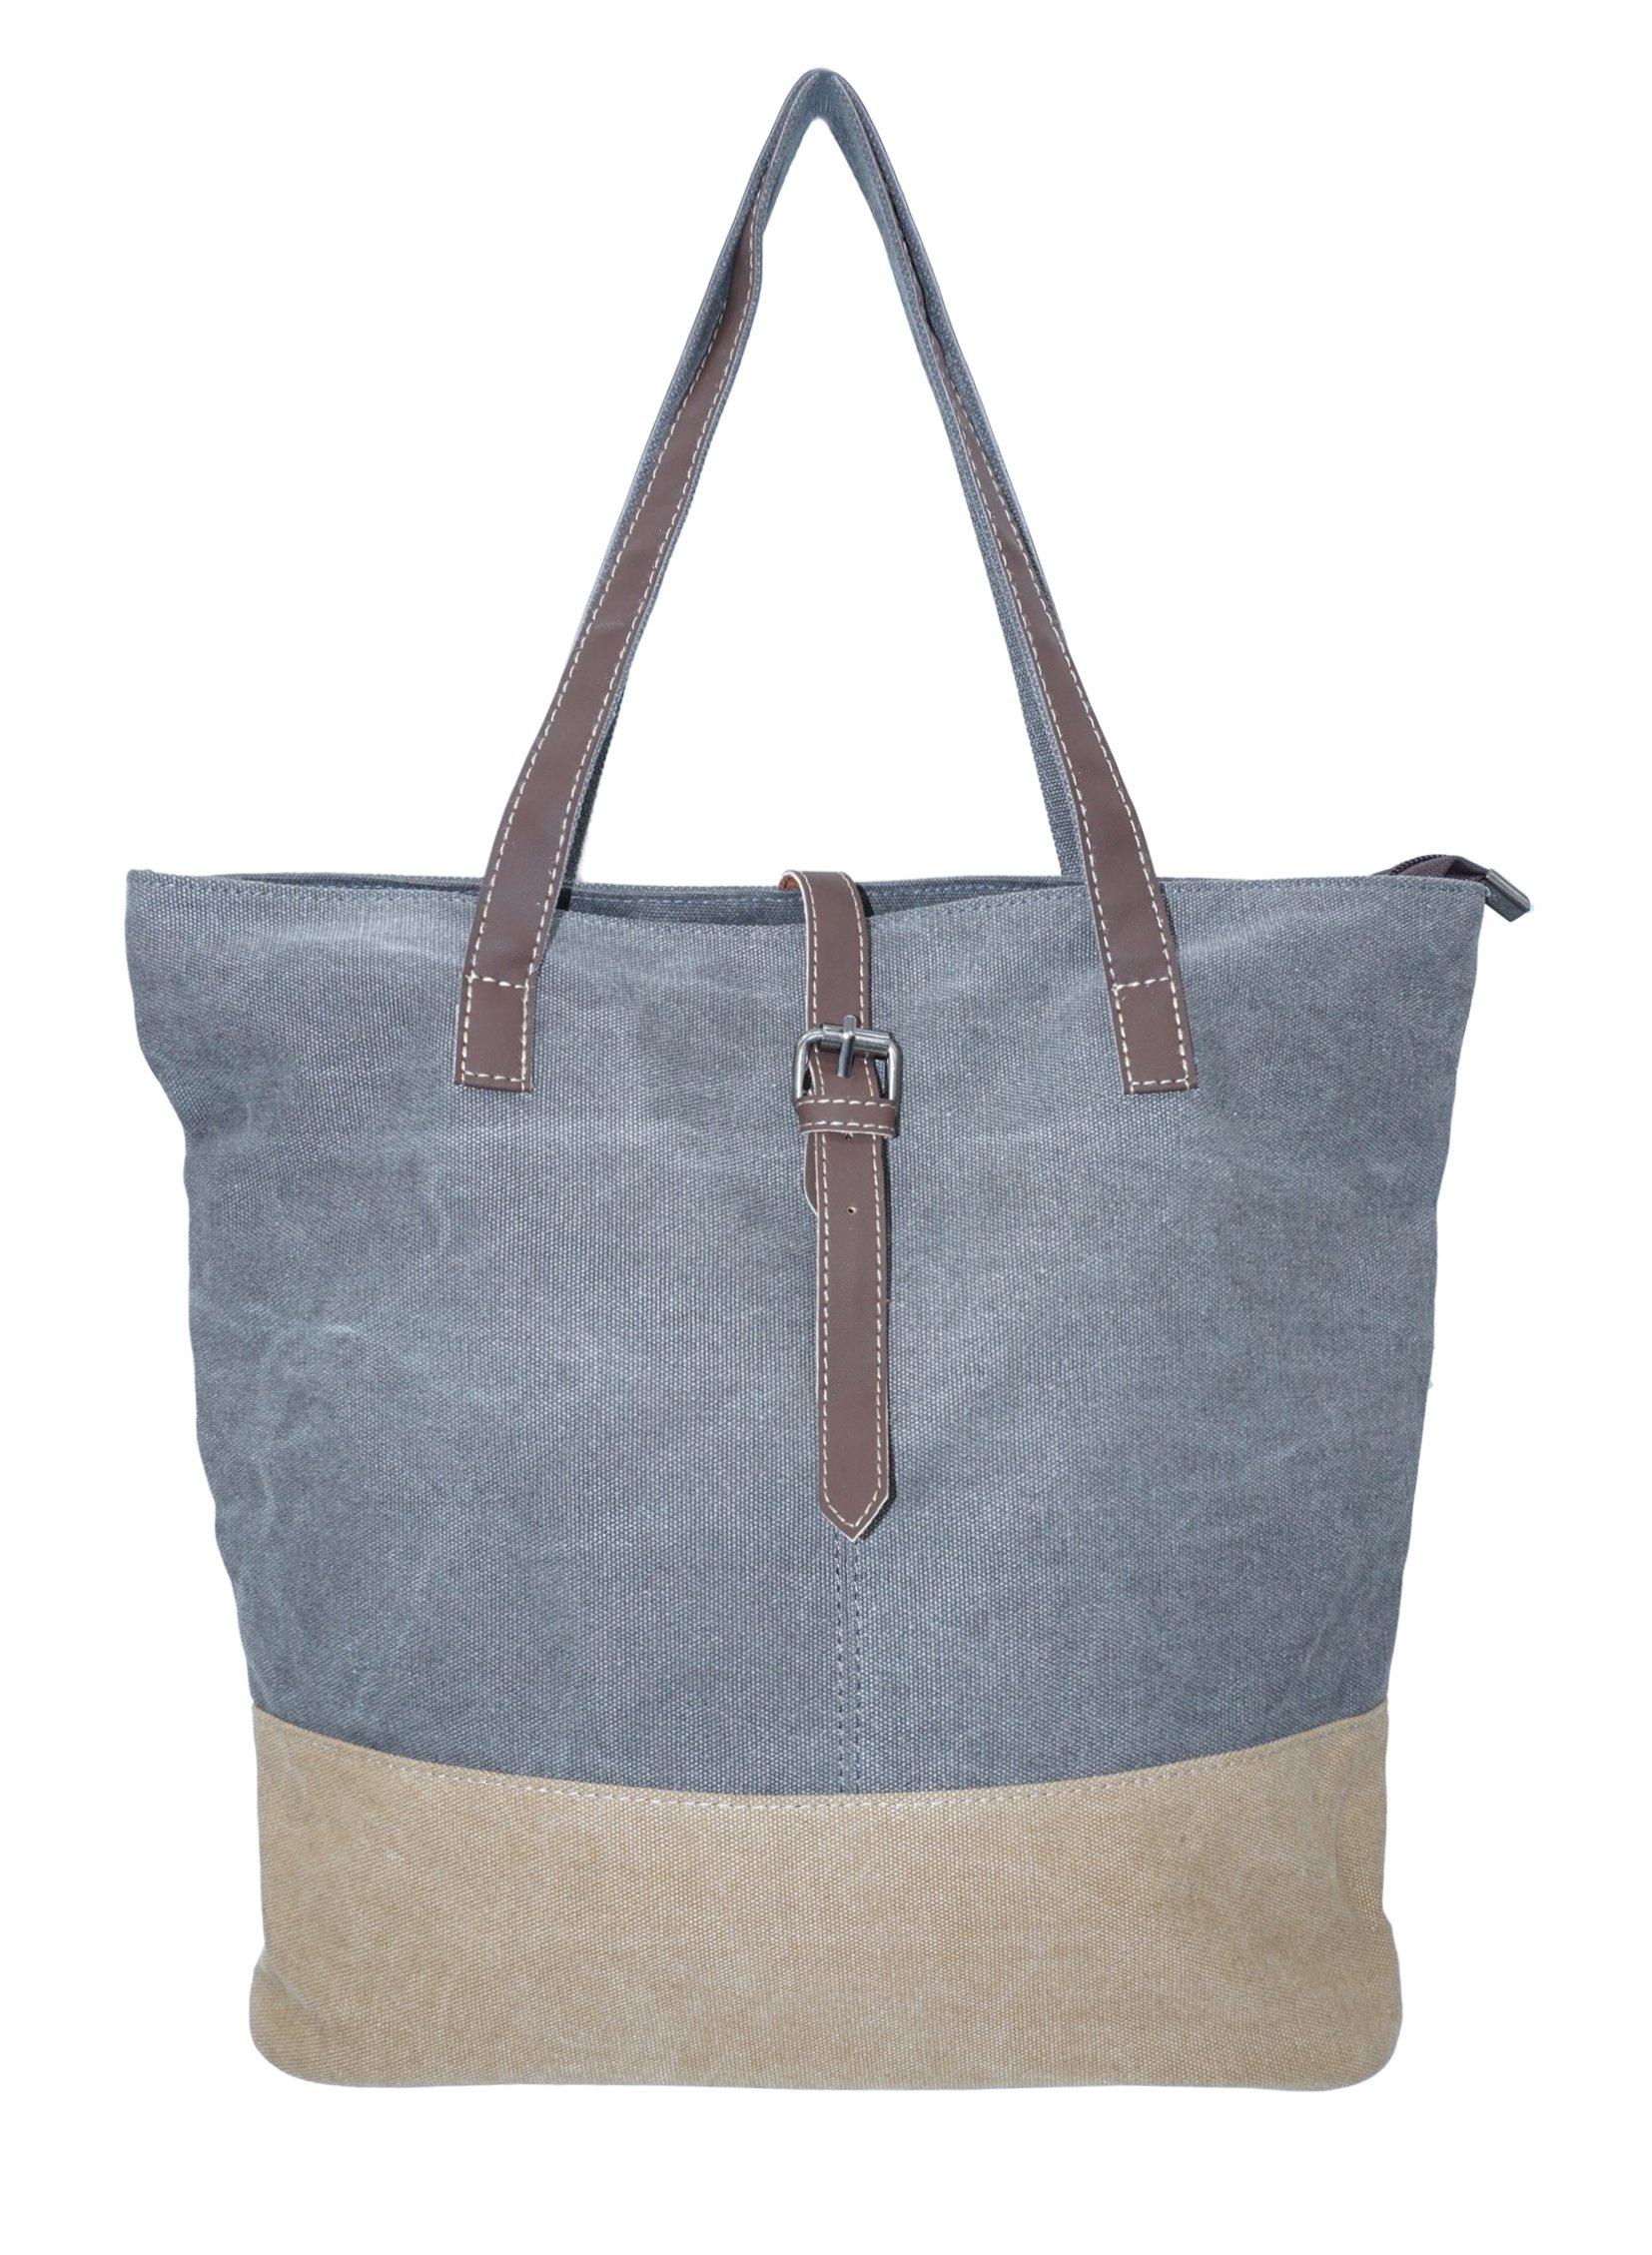 Canvas Tote Bag Fashion Shoulder Handbag Shopping School Pockets (Grey)